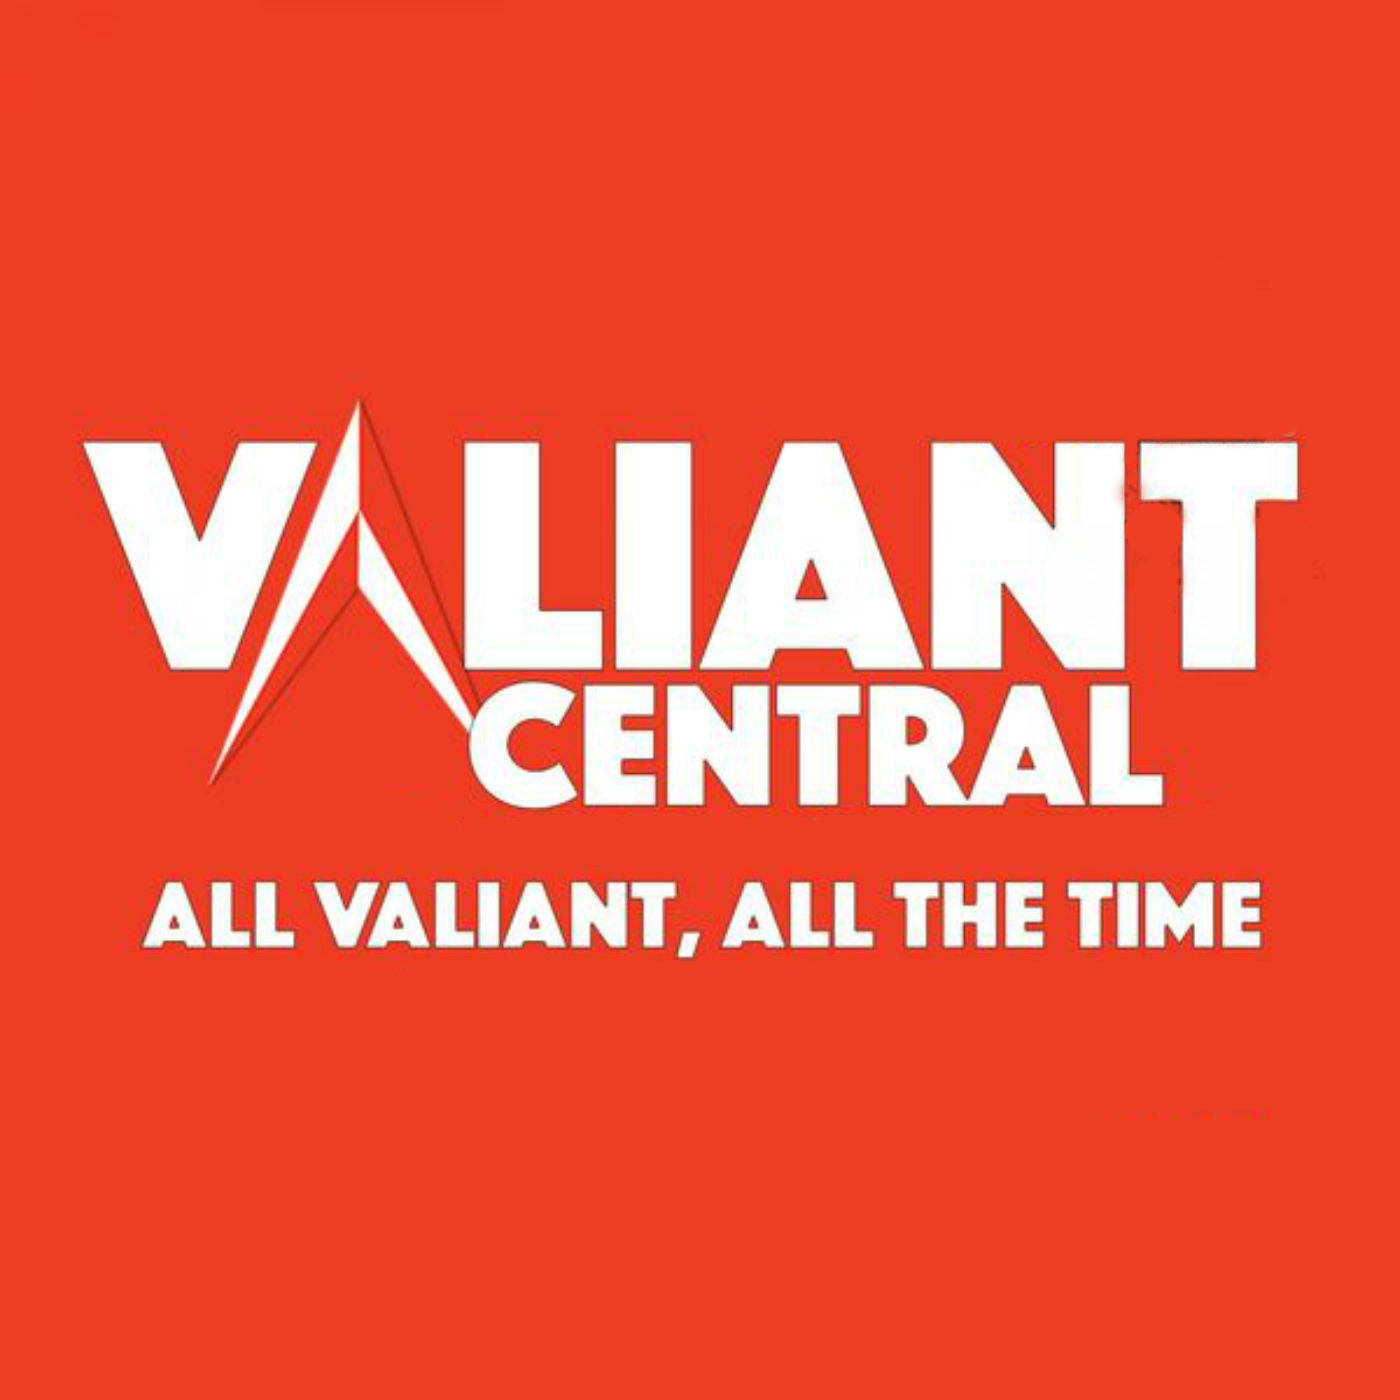 Valiant Central